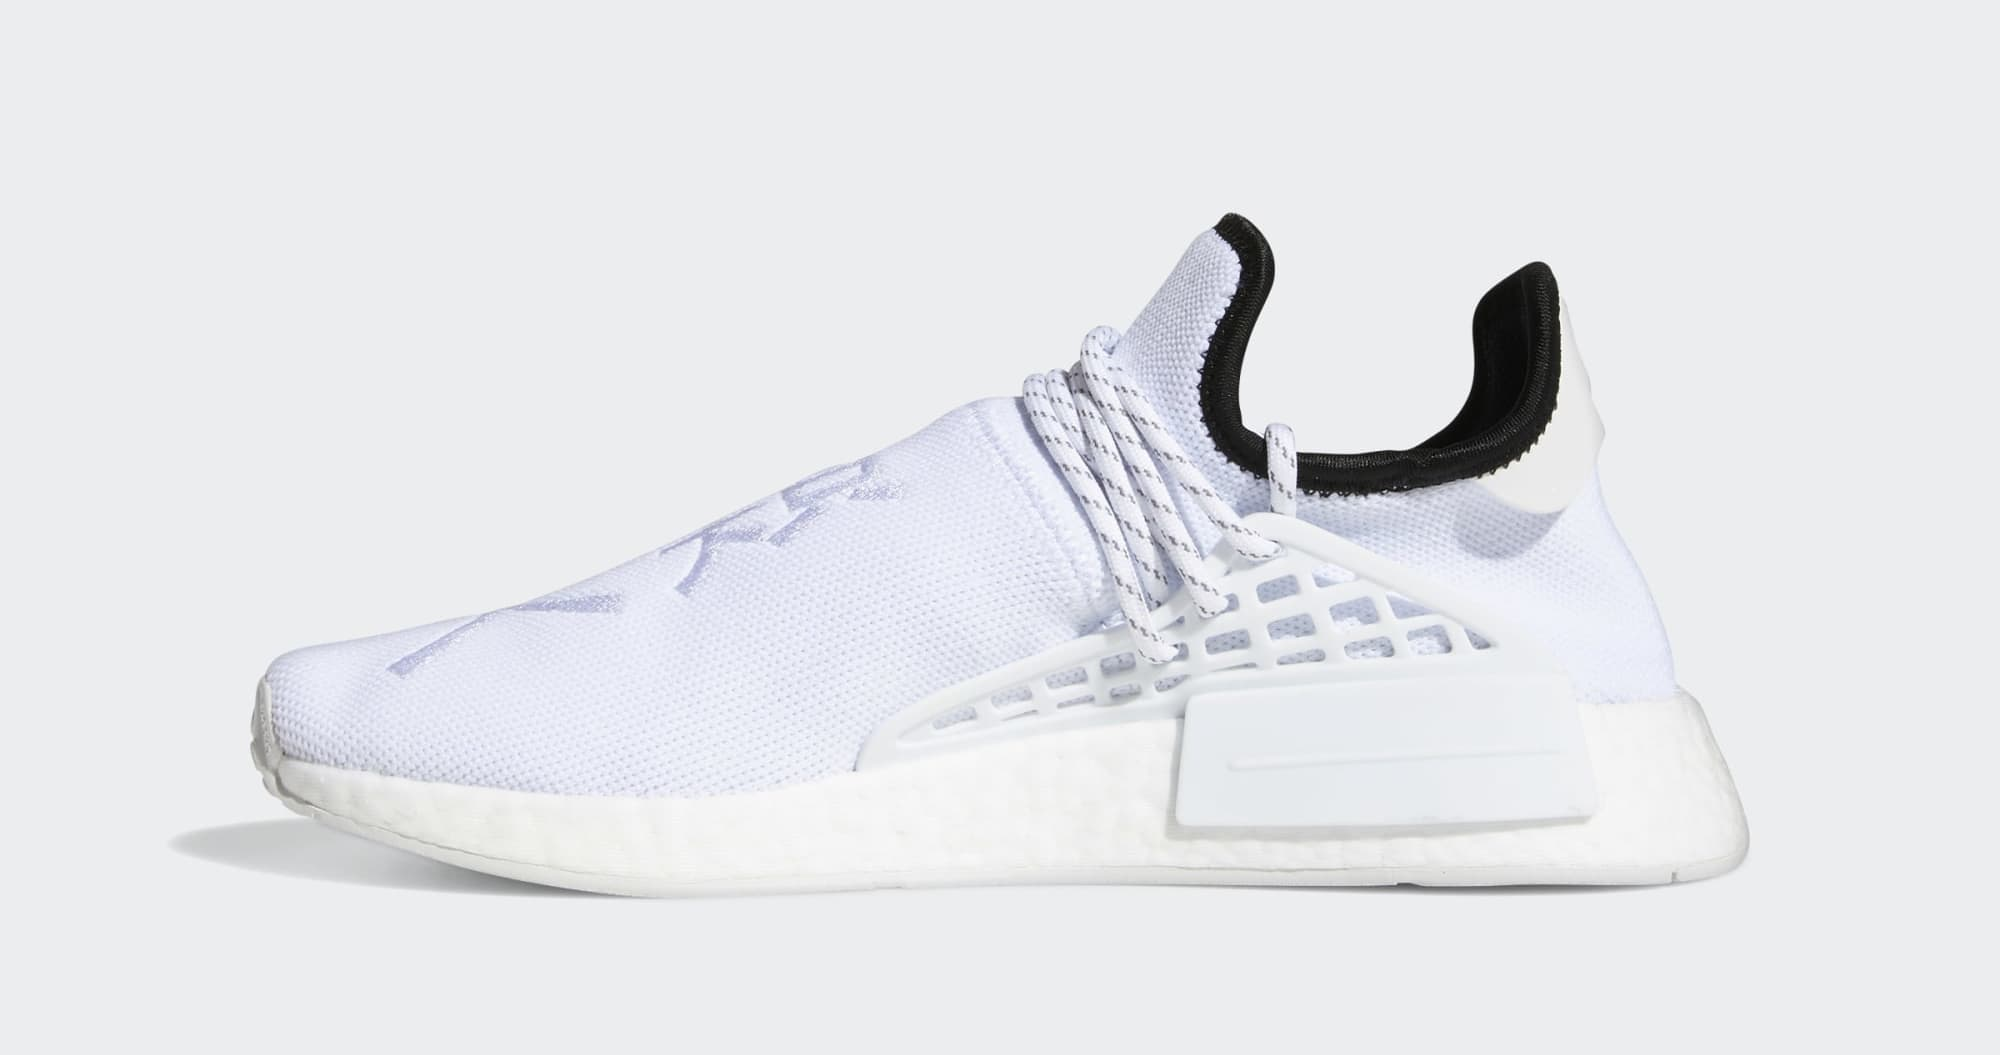 Pharrell Adidas NMD Hu White GY0092 Medial